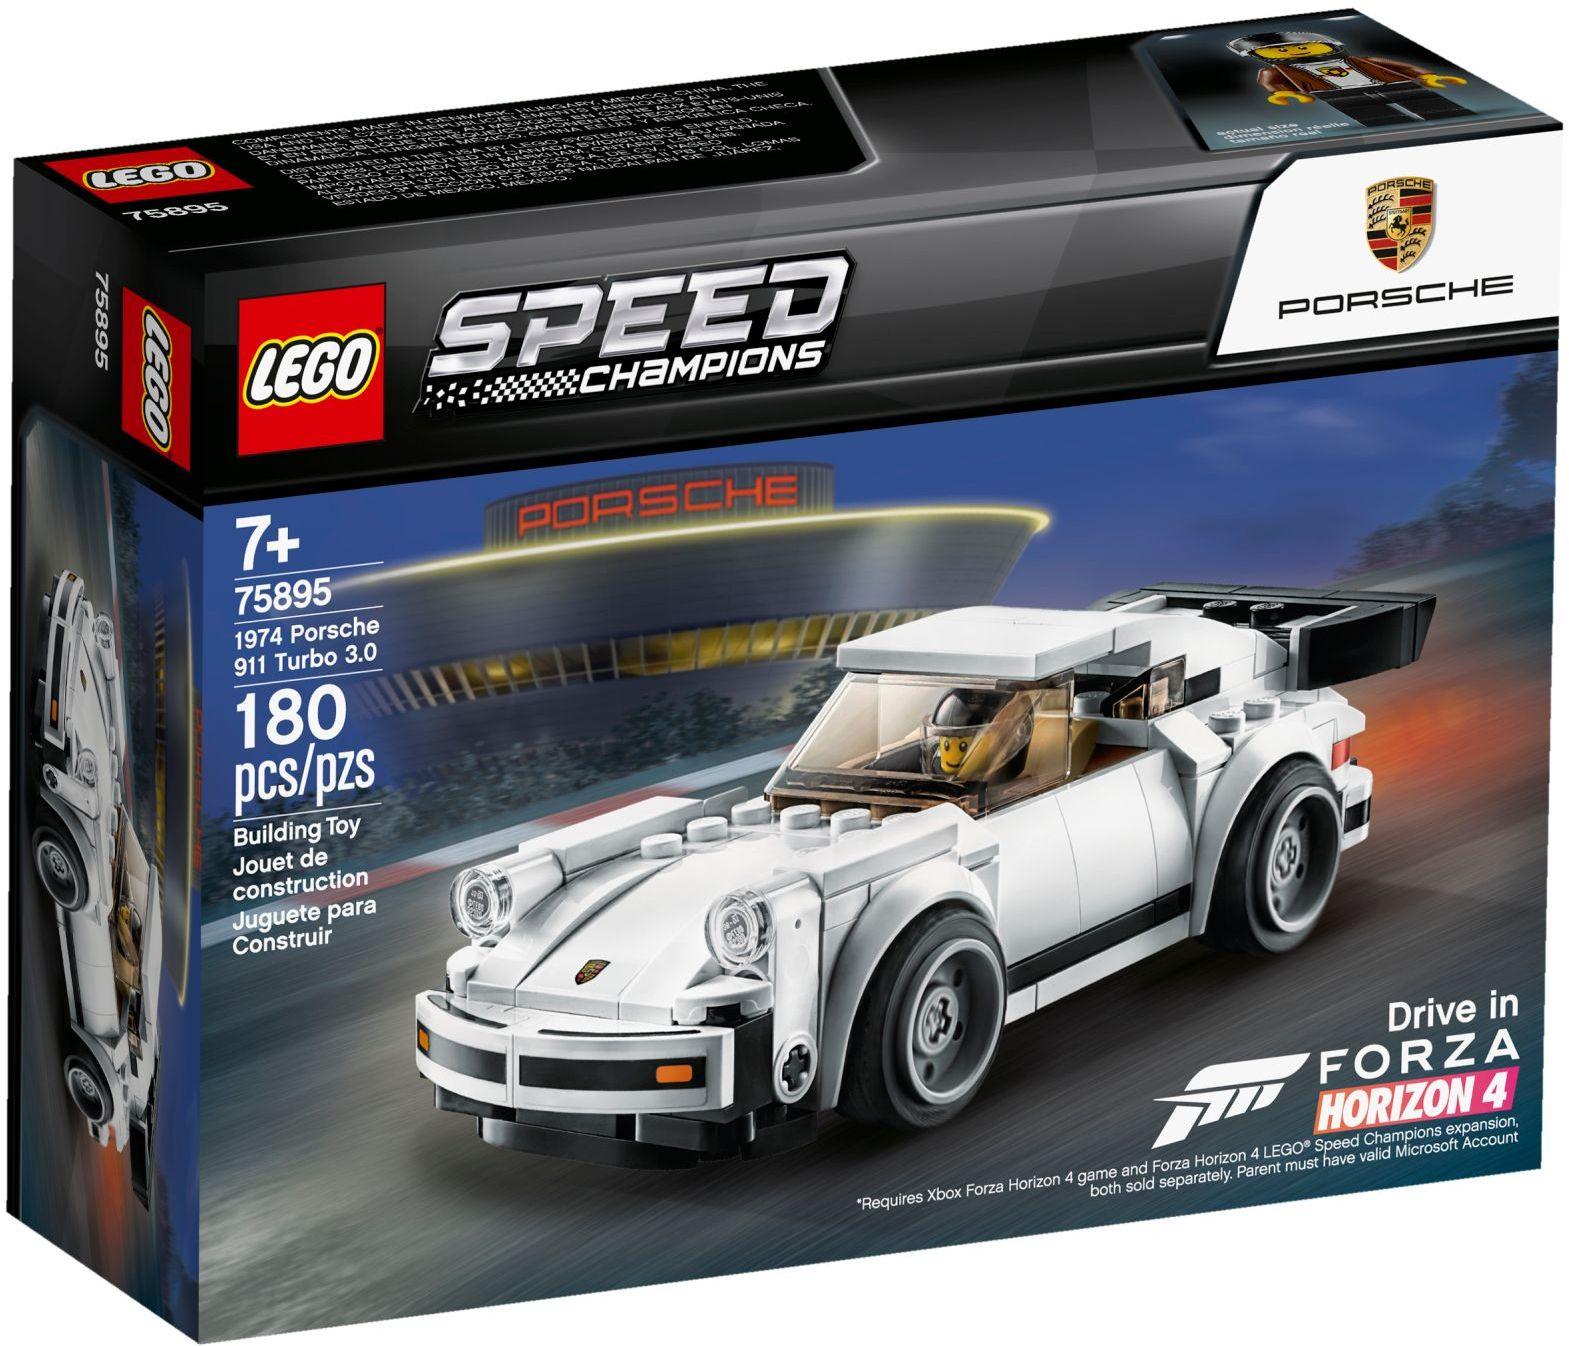 Lego 75895 1974 Porsche 911 Turbo 3.0 - siêu xe